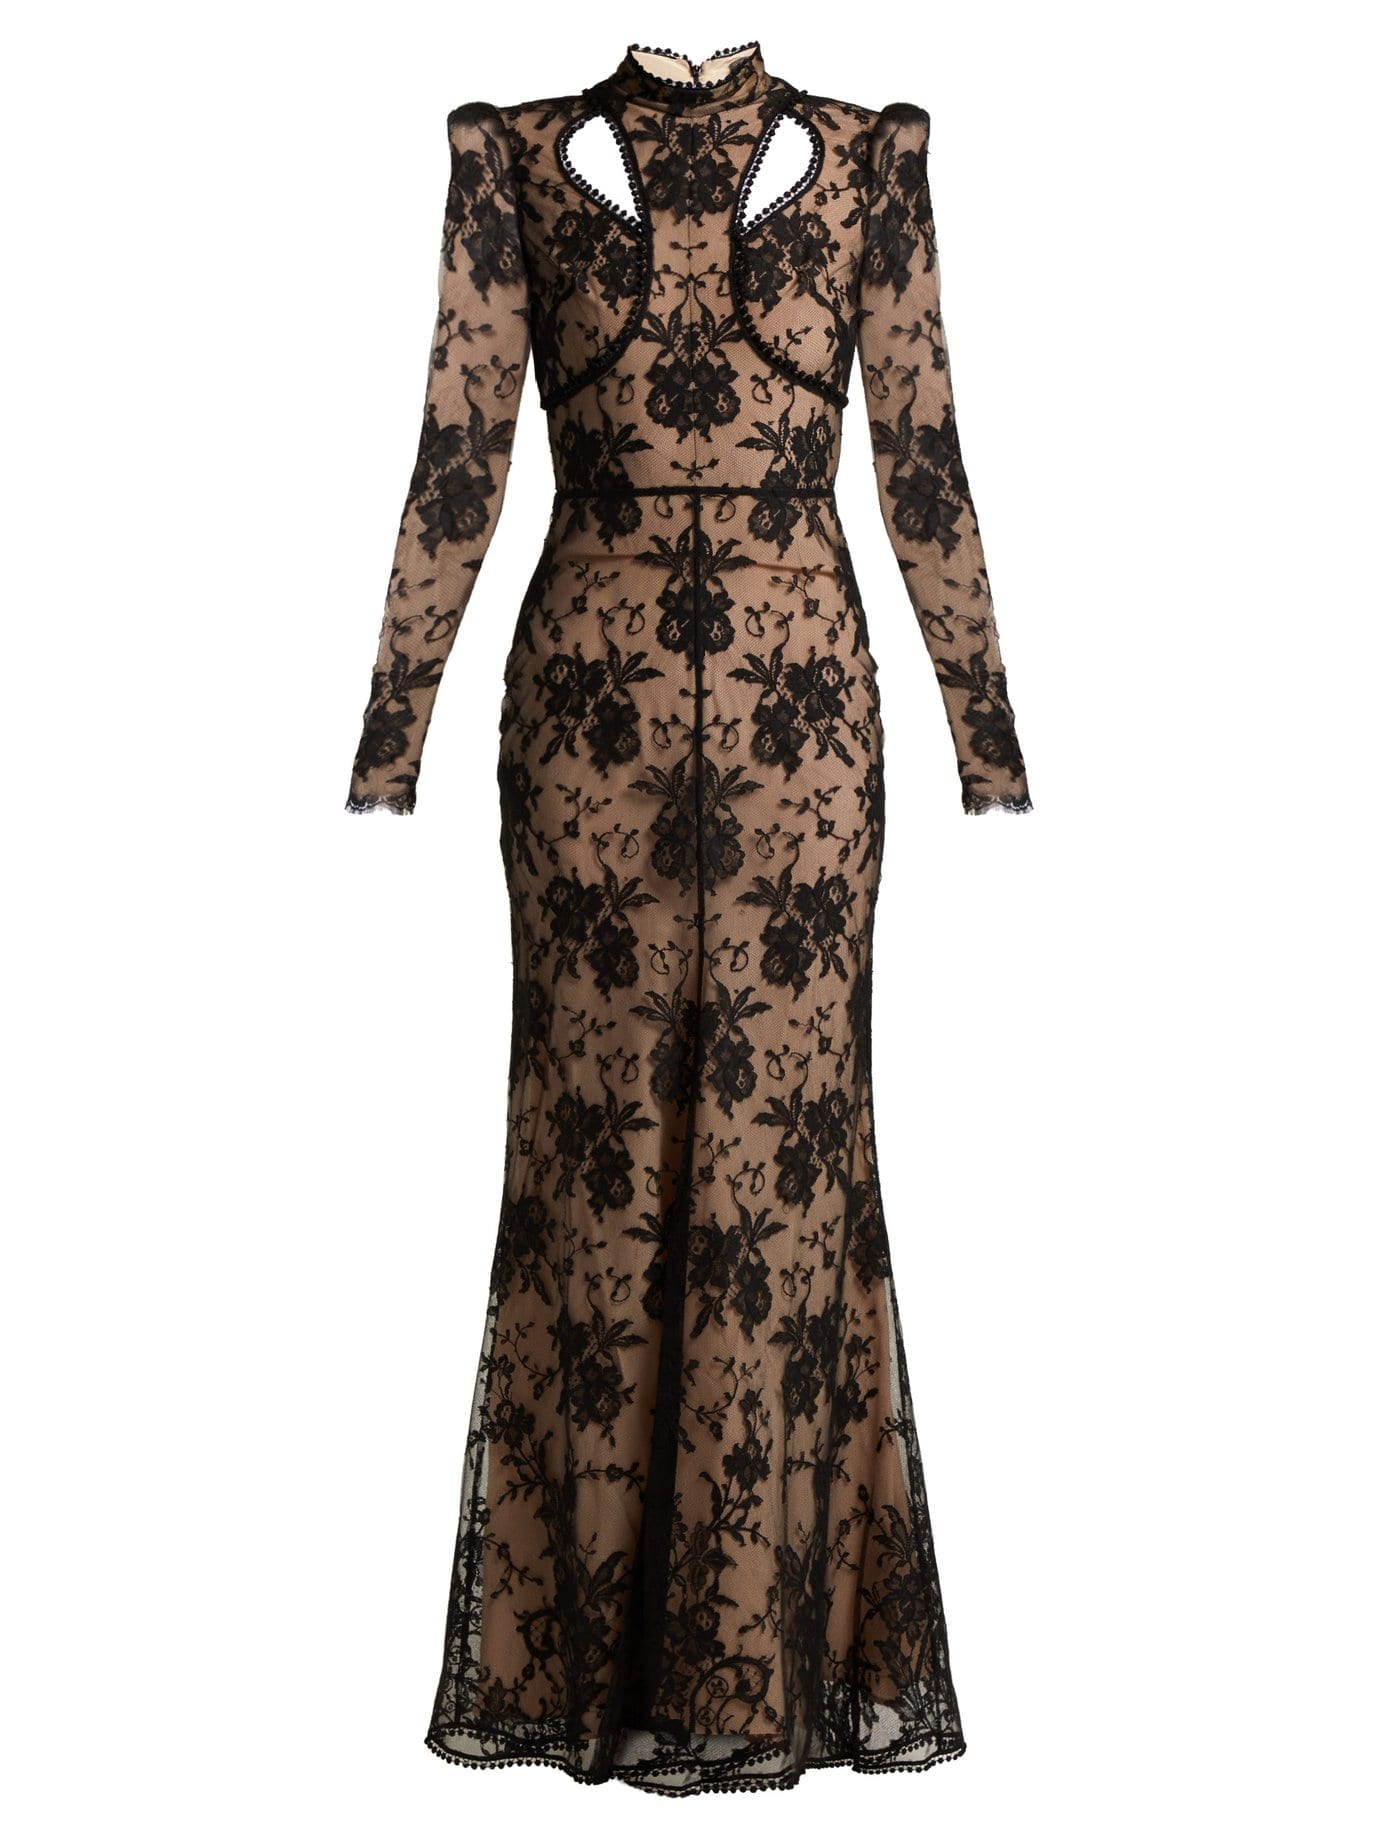 ALEXANDER MCQUEEN Cut Out Floral Lace Black Gown - We Select Dresses